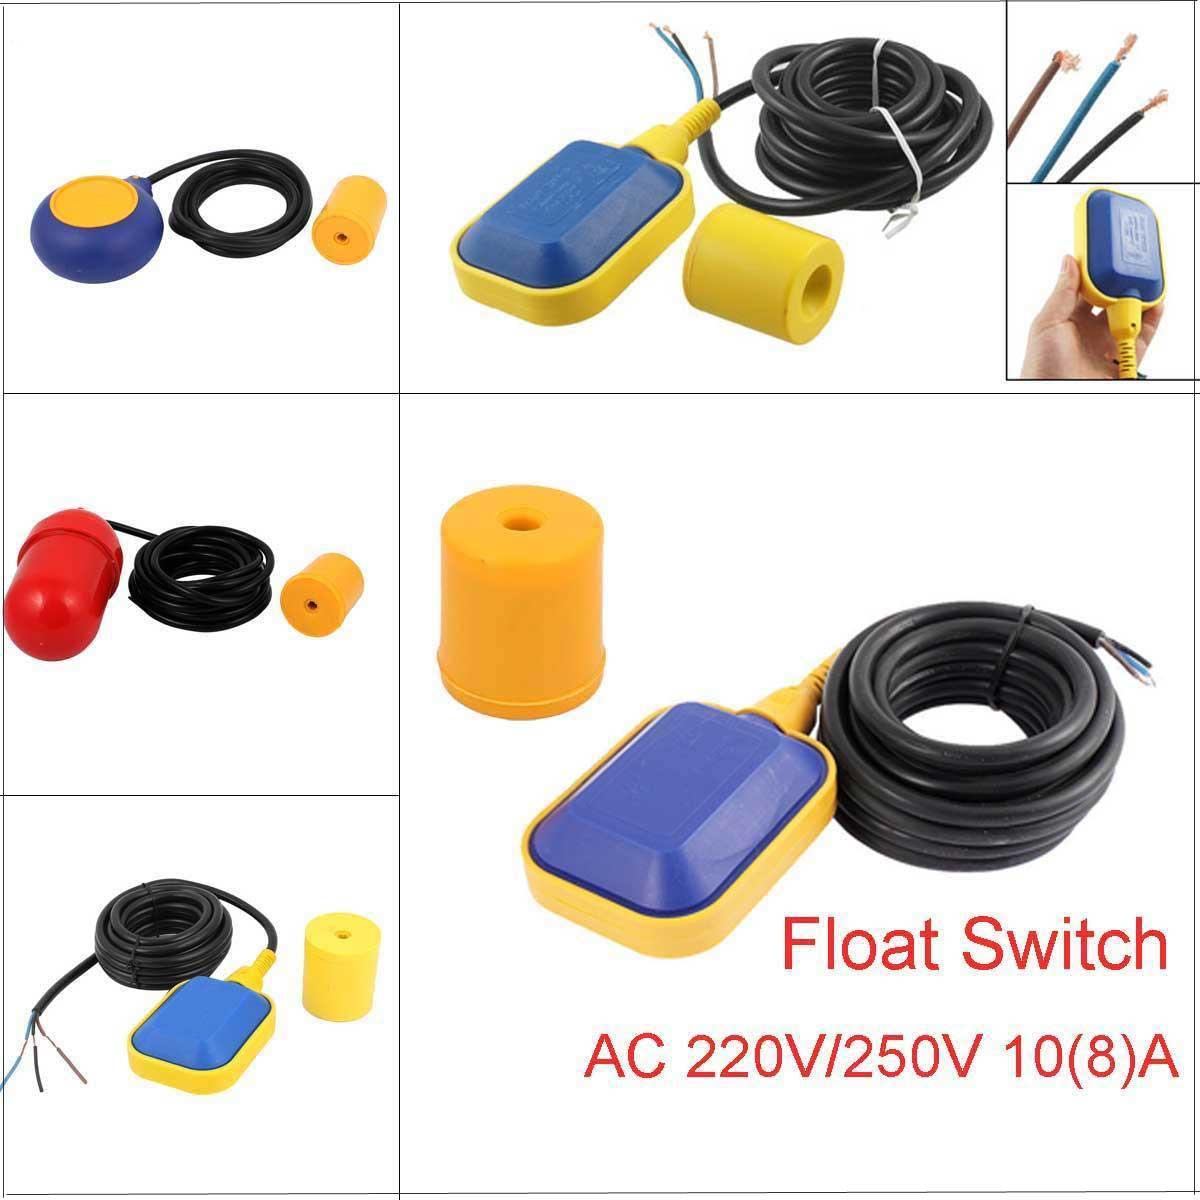 hight resolution of  float switch schematic water tank level sensor controller contactor liquid